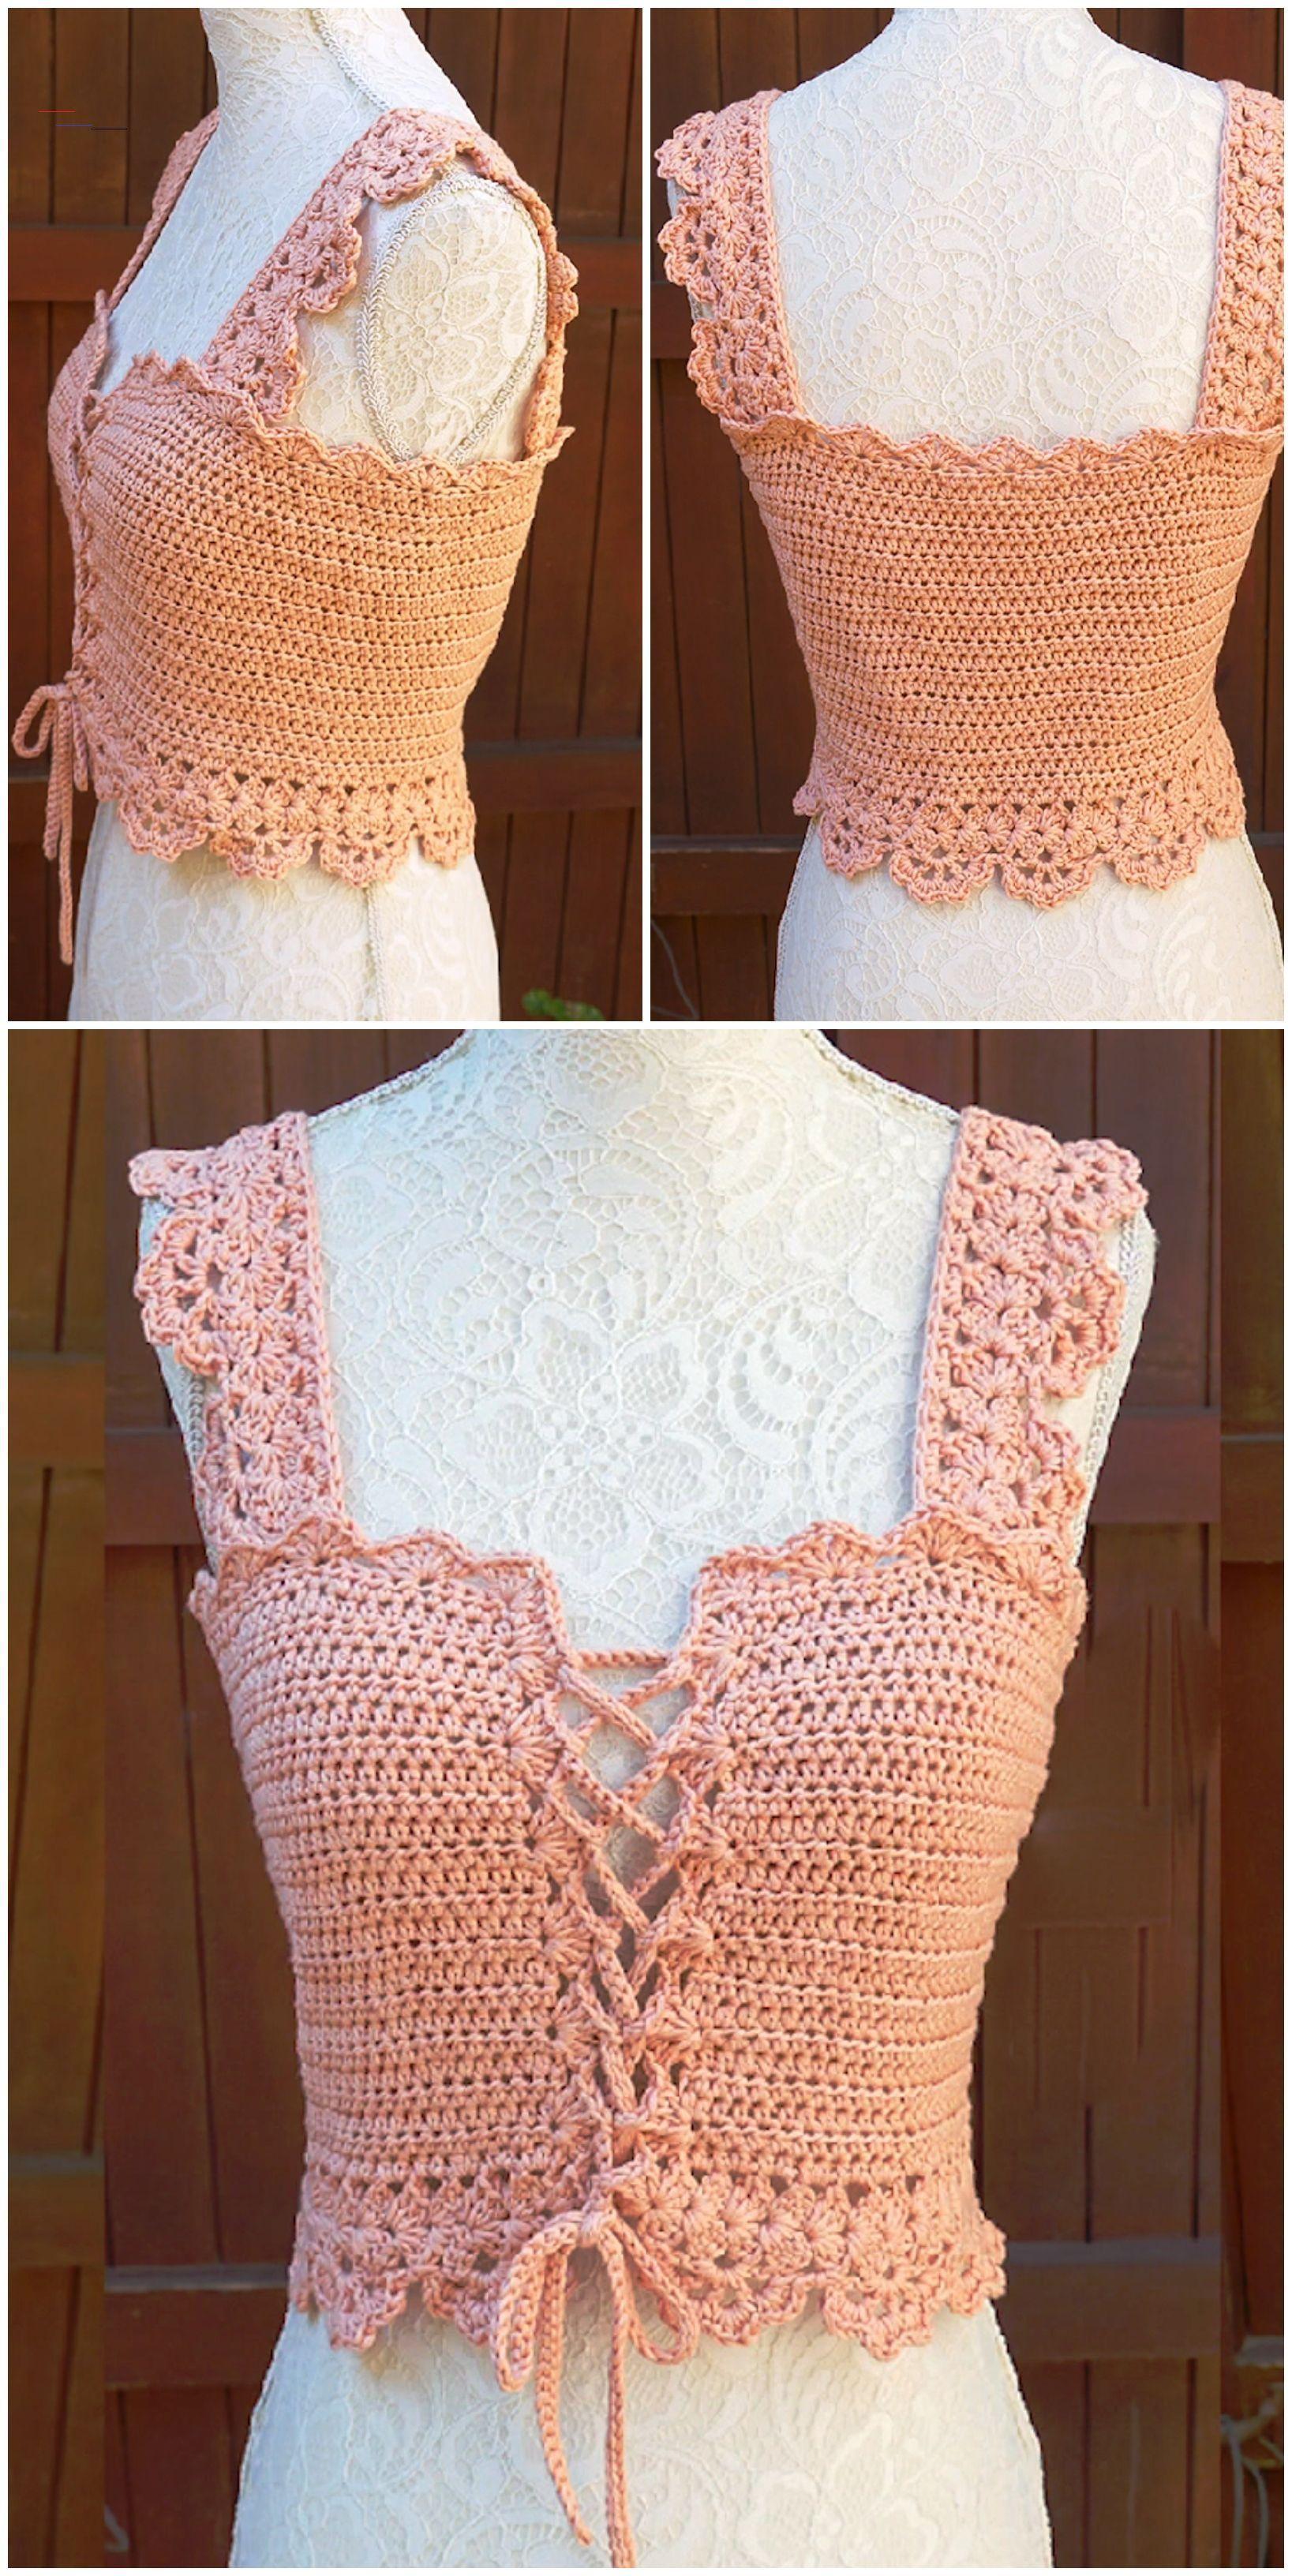 Crochet stylish corset top we love crochet